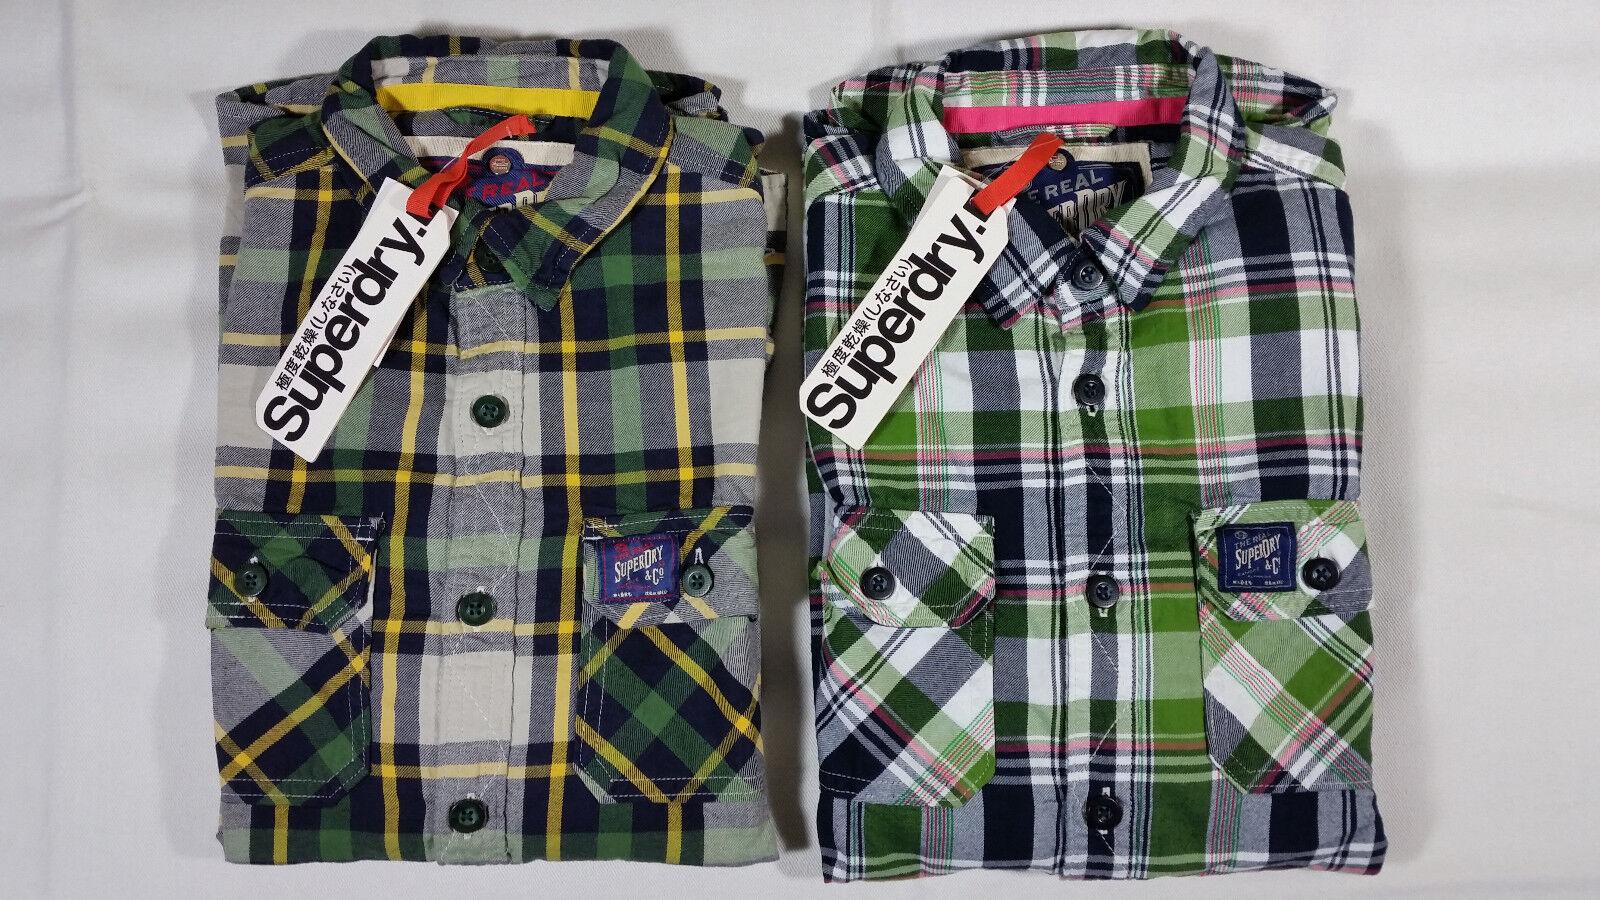 NWT SUPERDRY 100% Cotton Classic Plaid Casual Shirt Mens Sizes Small, Medium